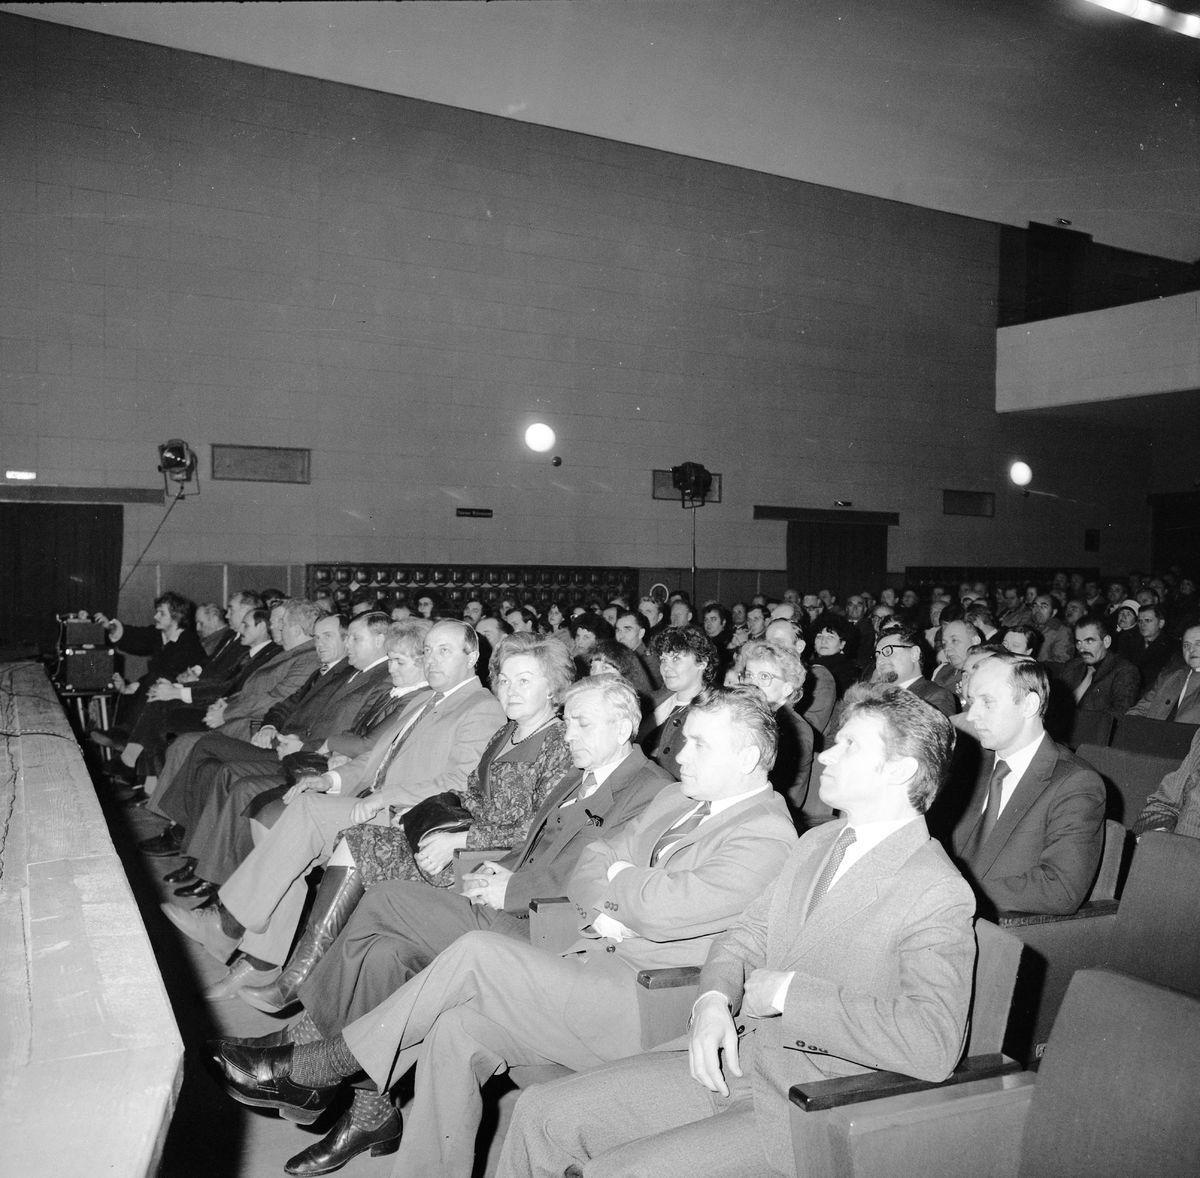 Wizyta konsula ZSRR [2]